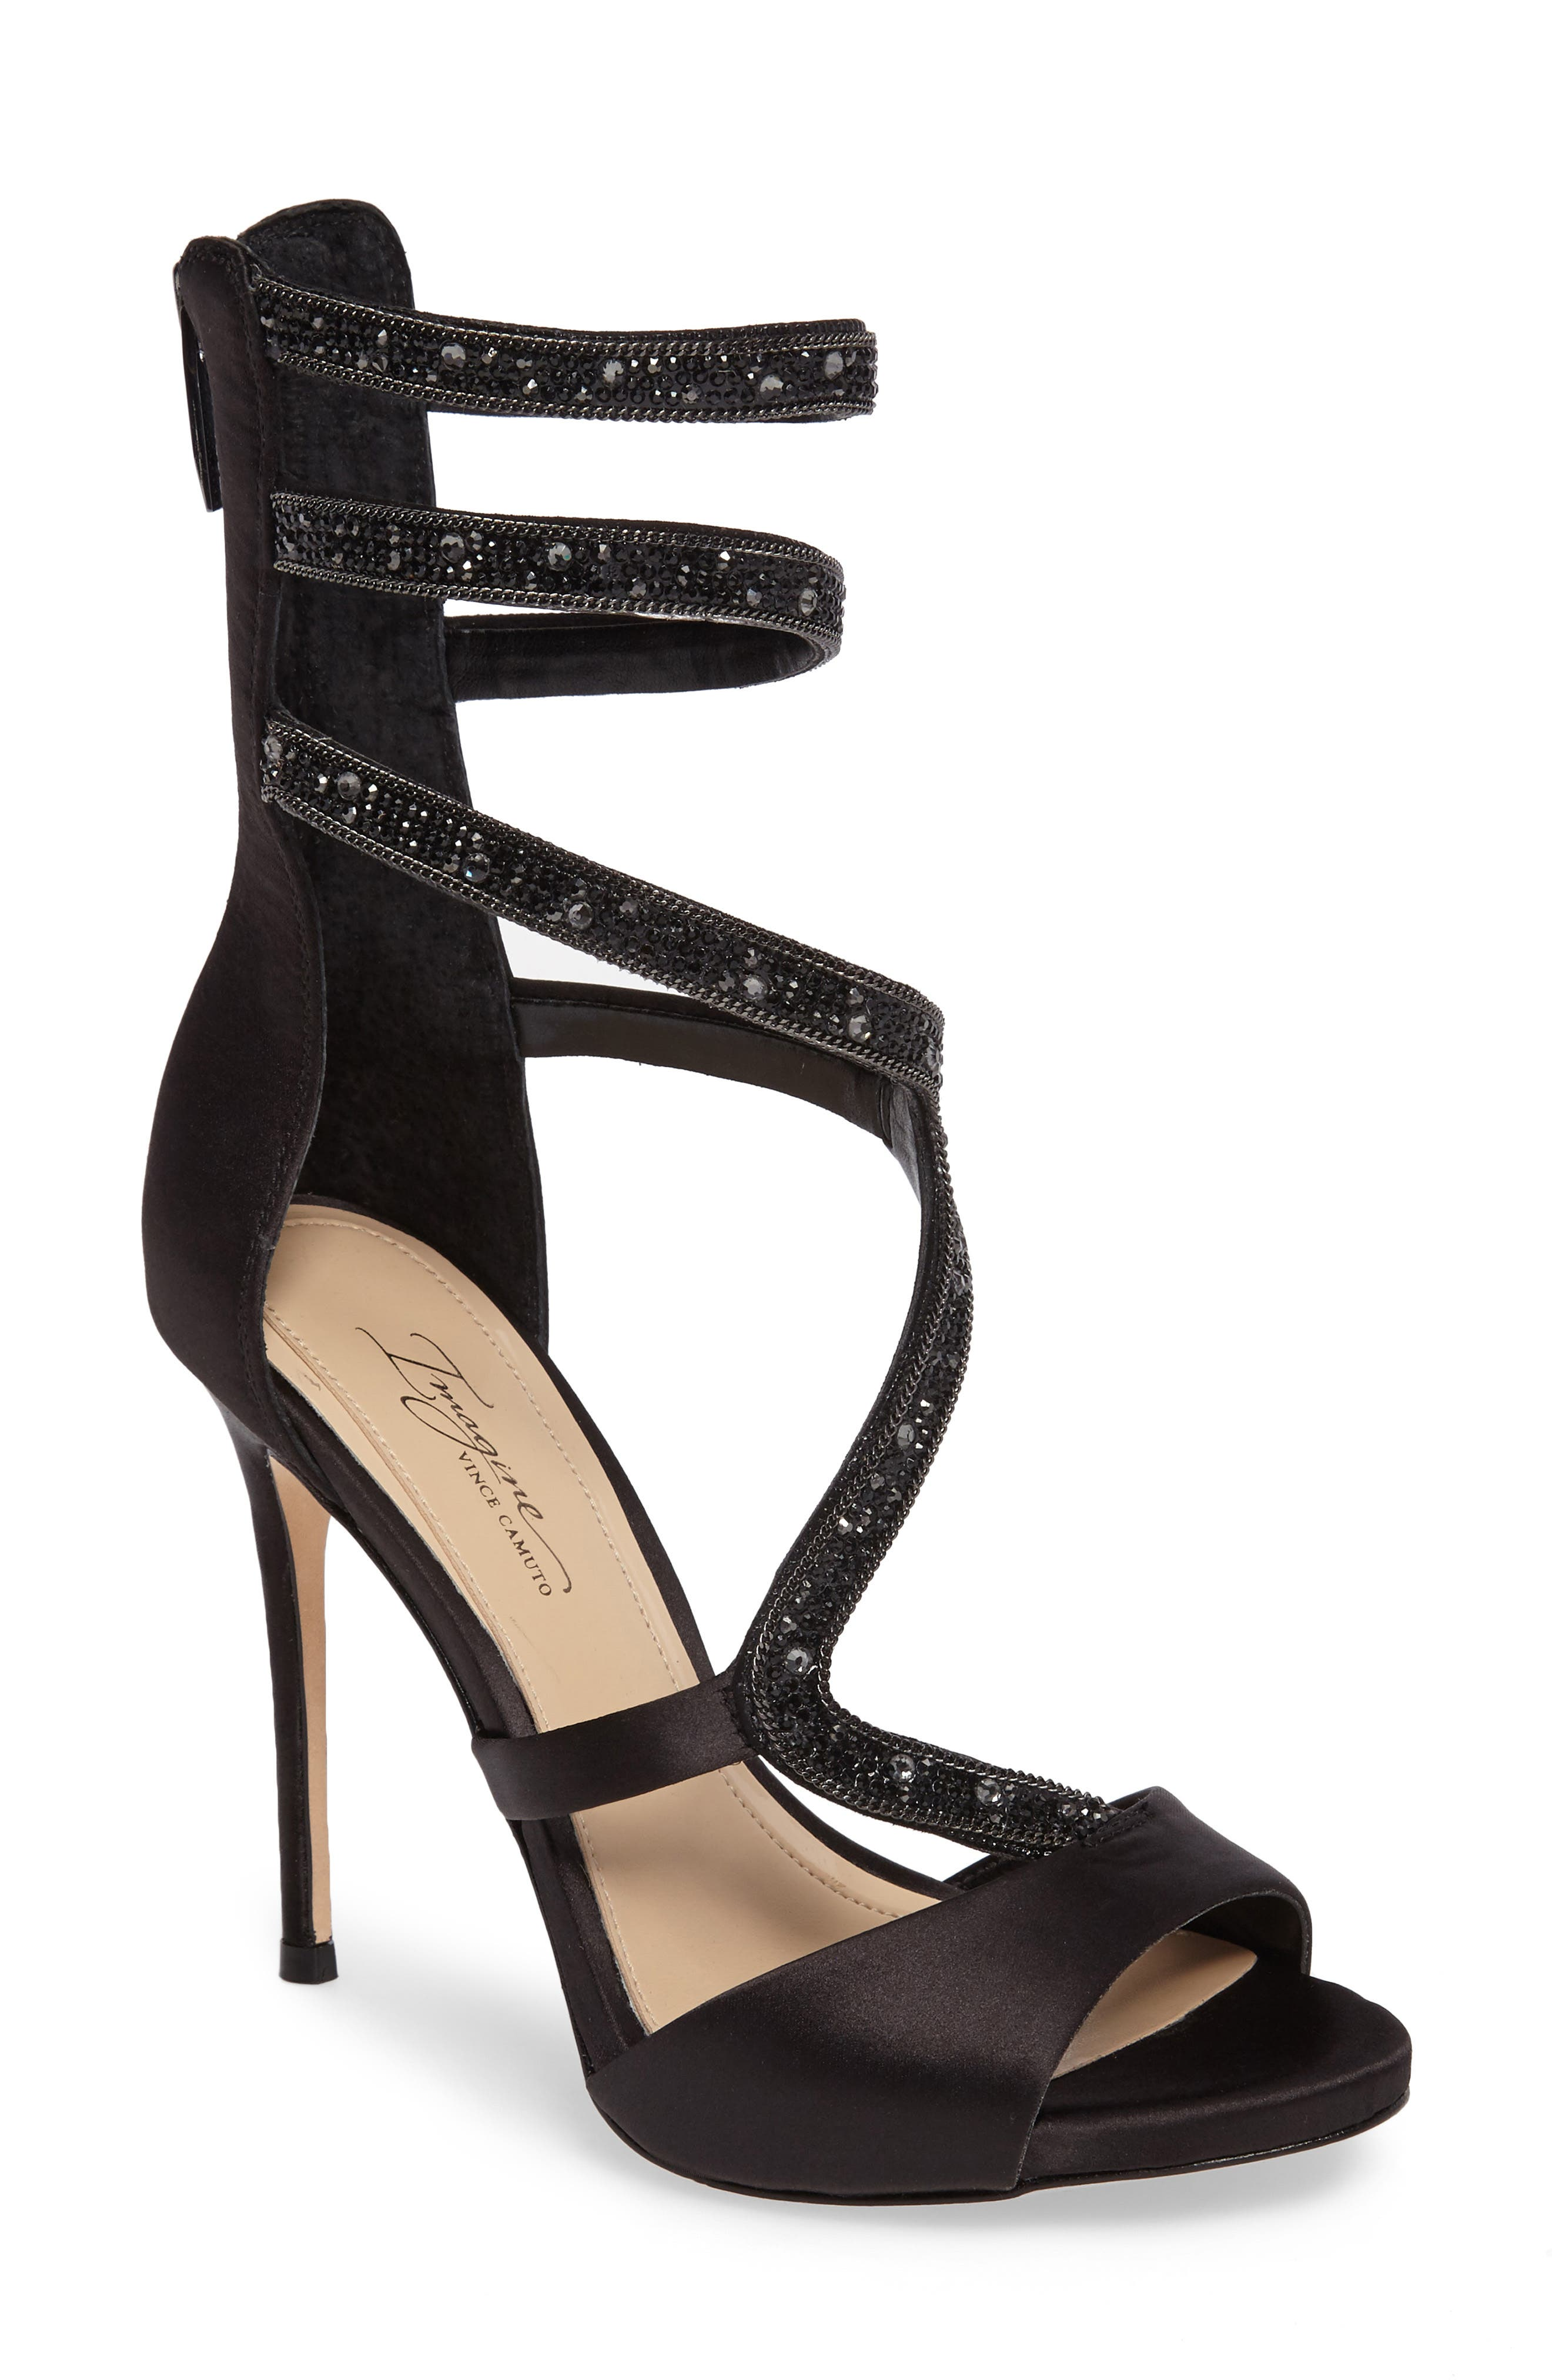 Imagine Vince Camuto Dafny Embellished Sandal,                             Main thumbnail 1, color,                             Black Satin